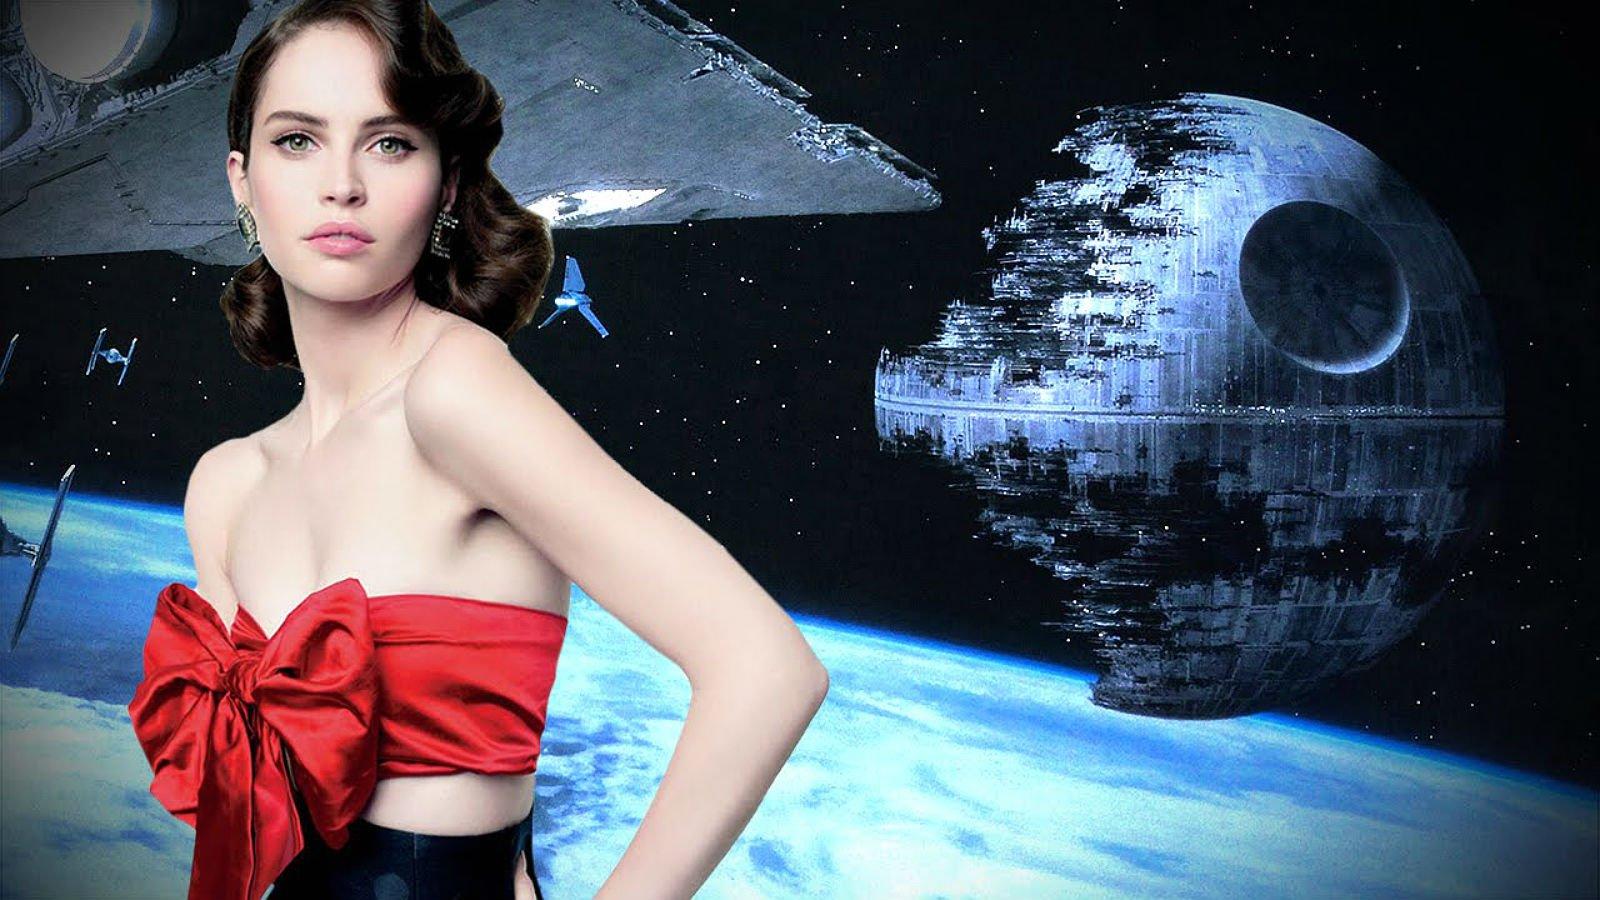 Star Wars Rogue One Wallpaper: ROGUE ONE Star Wars Story Sci-fi Space Futuristic Opera